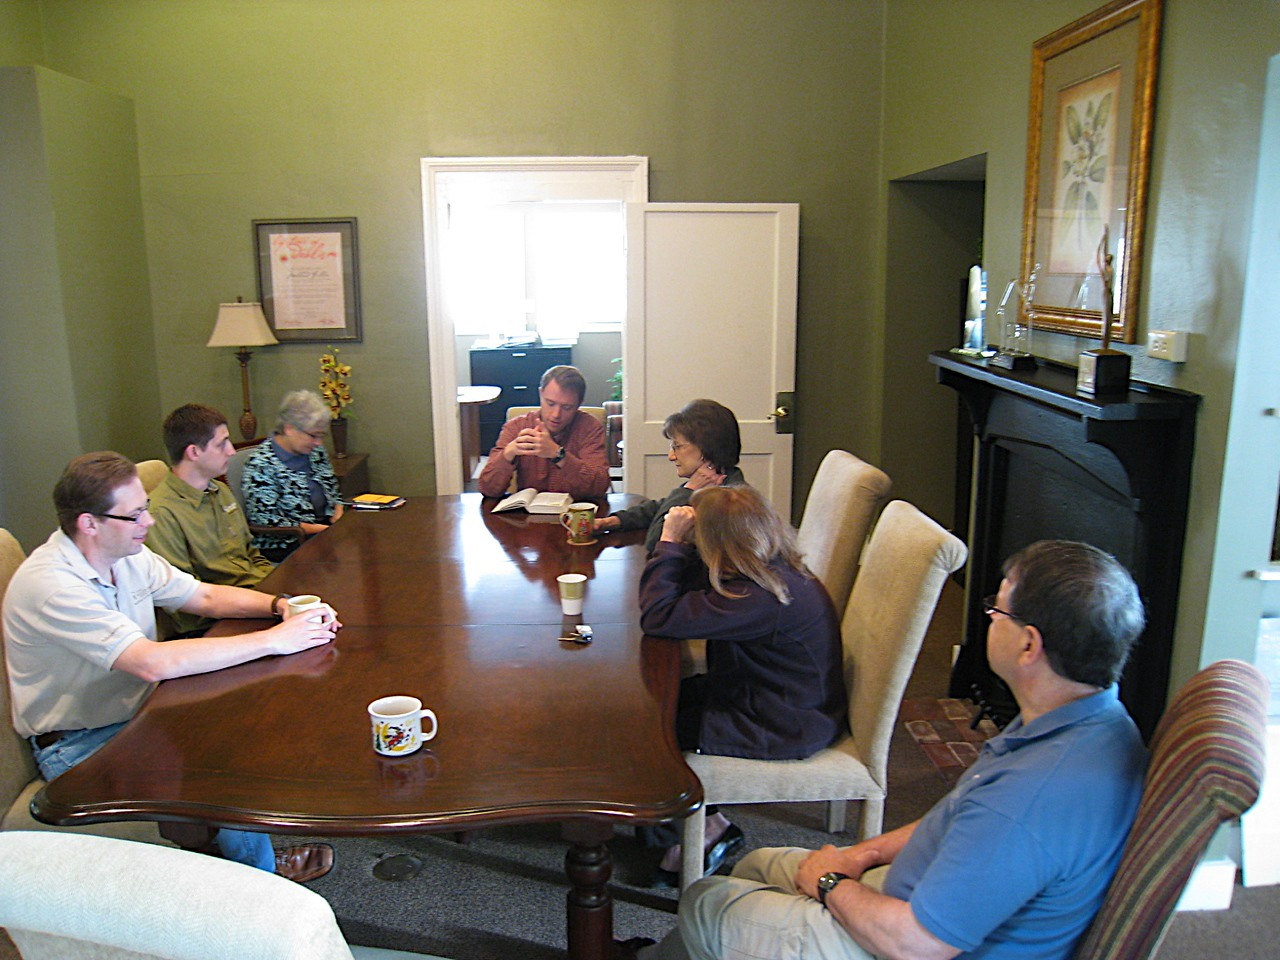 09 04-16 Presbyterian Pastor Allan Purtill leads devotions for 4th anniversary of FCH. Faith Fuller